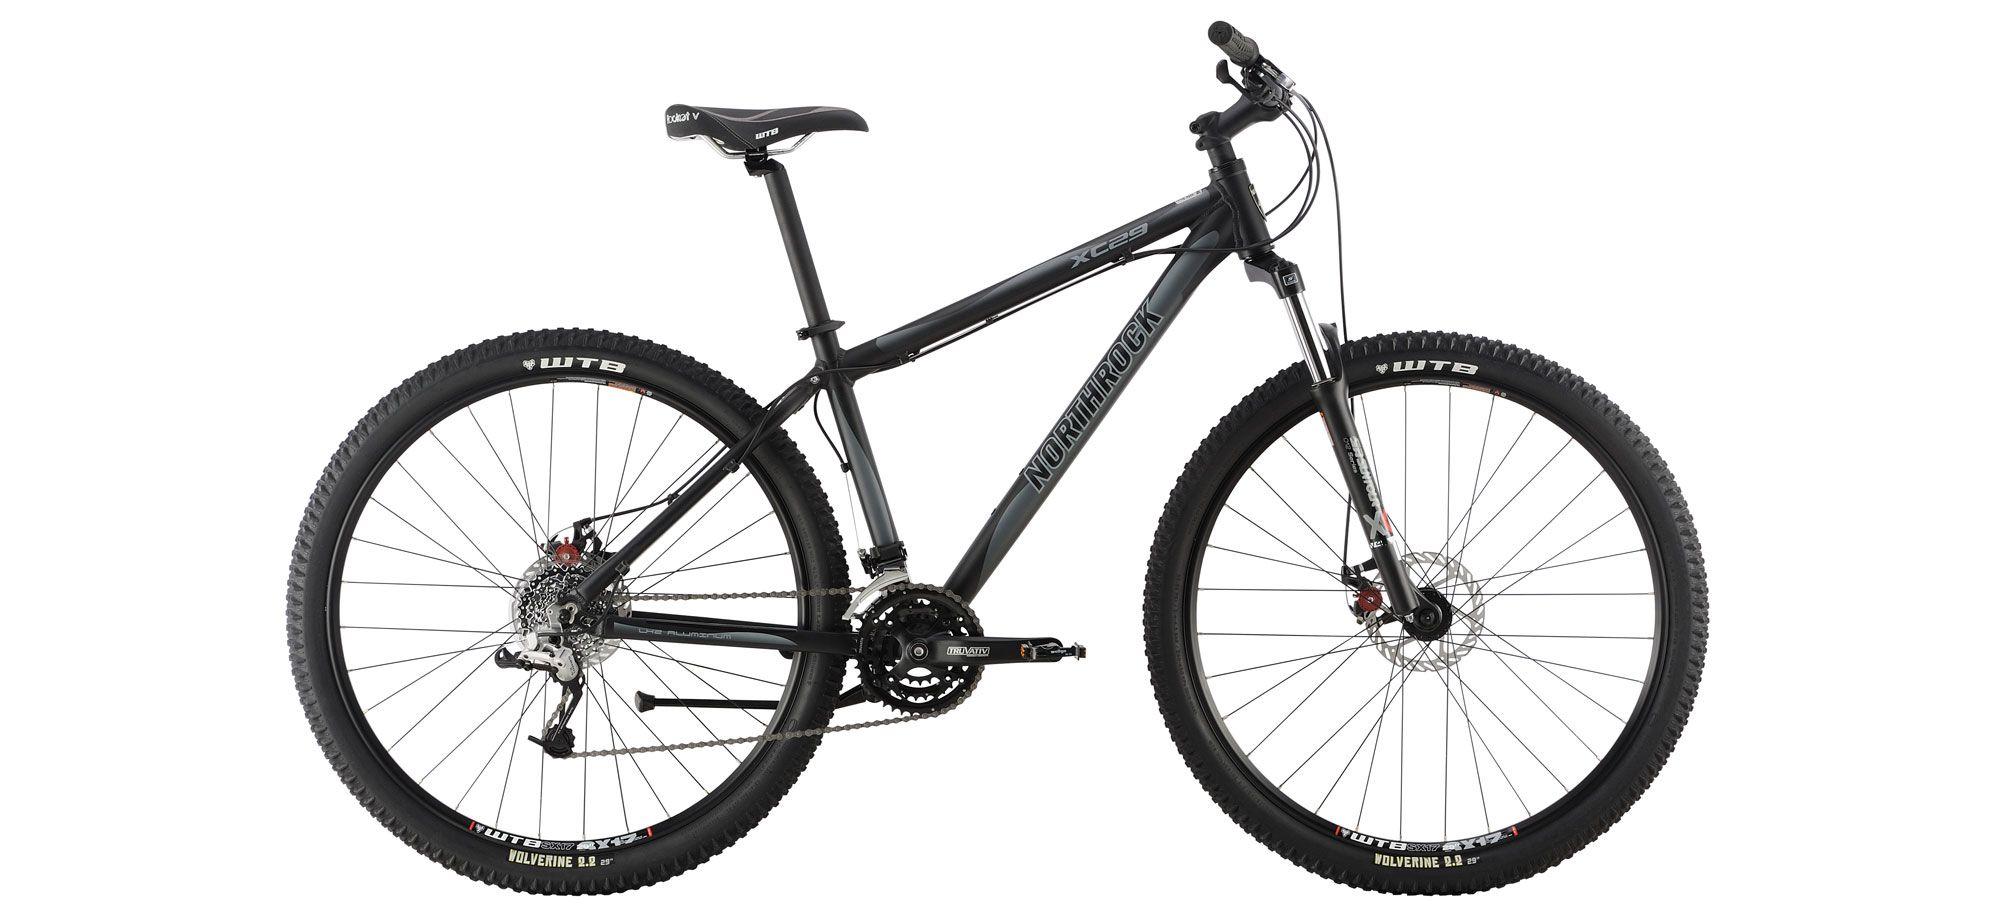 Northrock Bike Mountain Bike Xc29 Bike Mountain Biking Bicycle